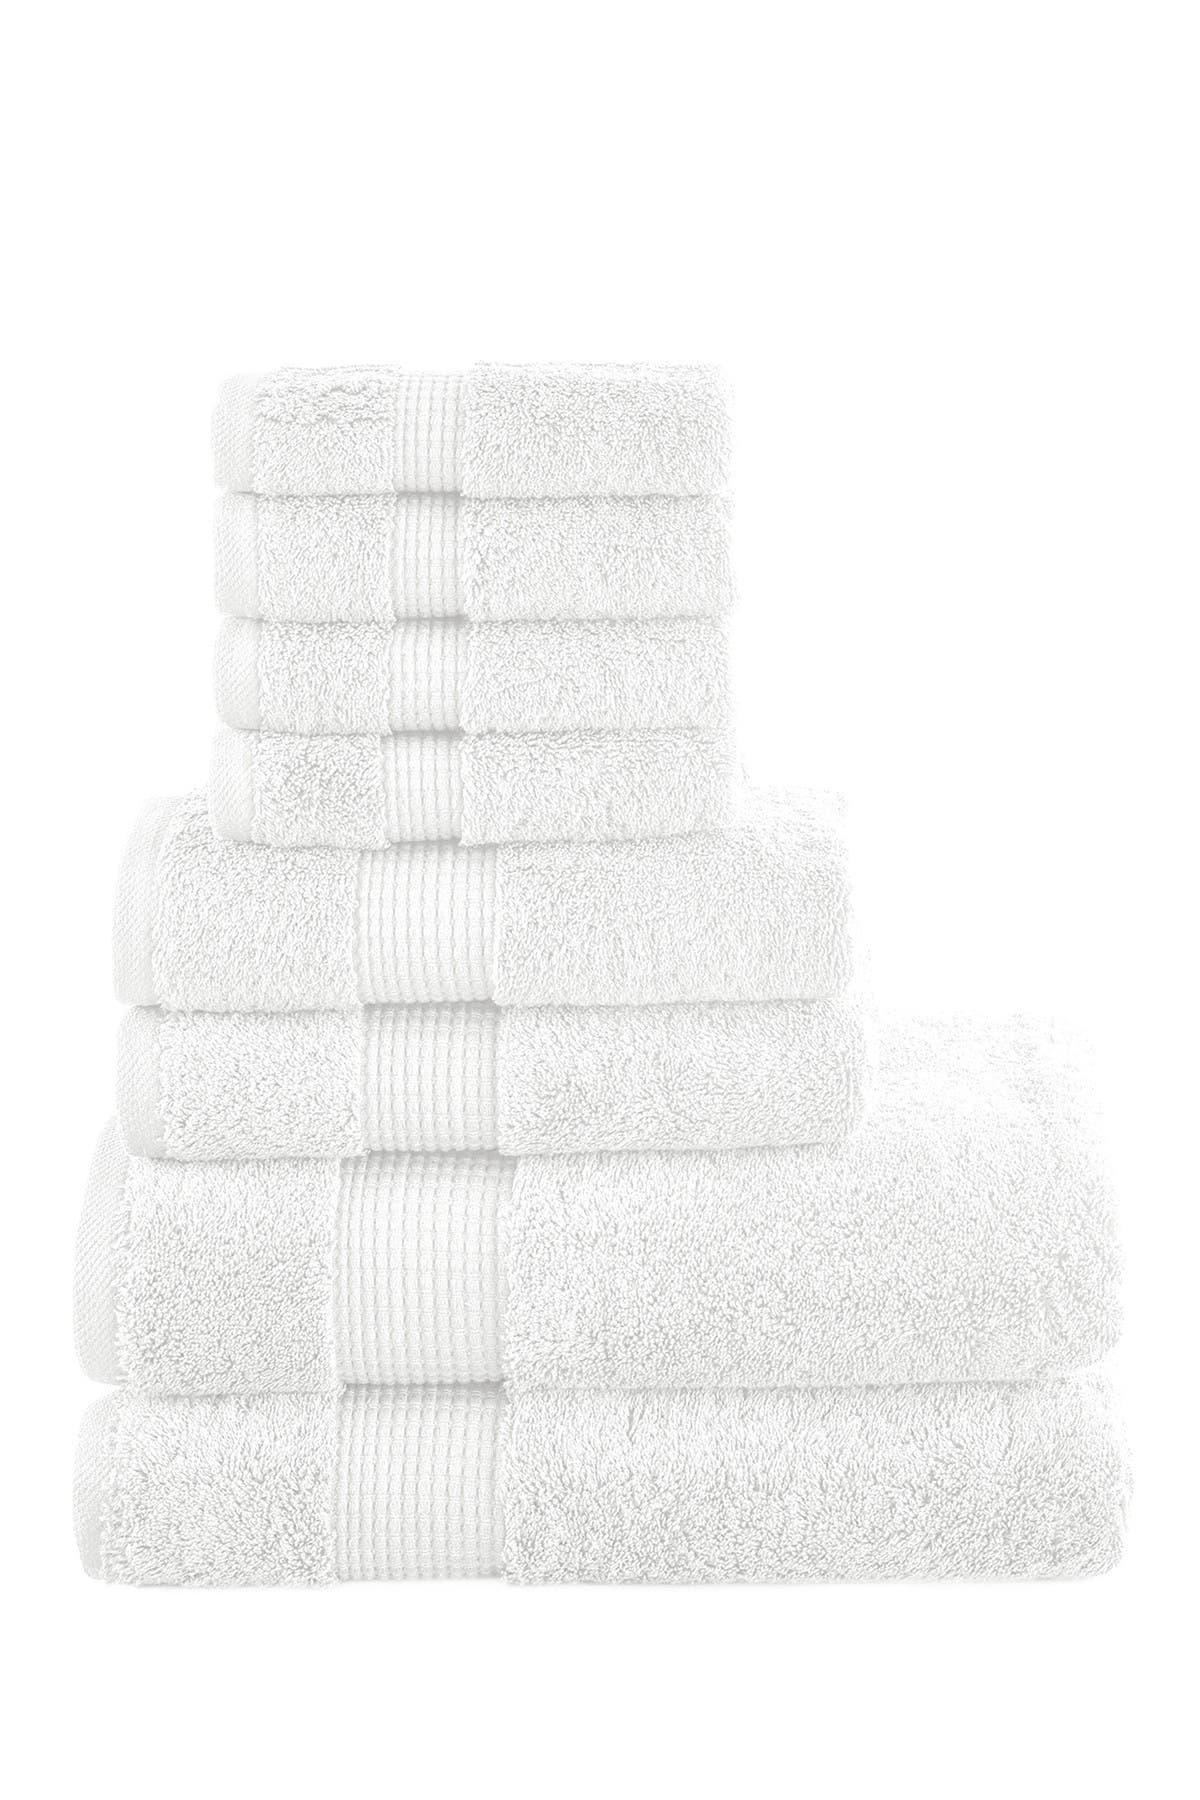 Image of Modern Threads Manor Ridge Turkish Cotton 700 GSM 8-Piece Towel Set - White